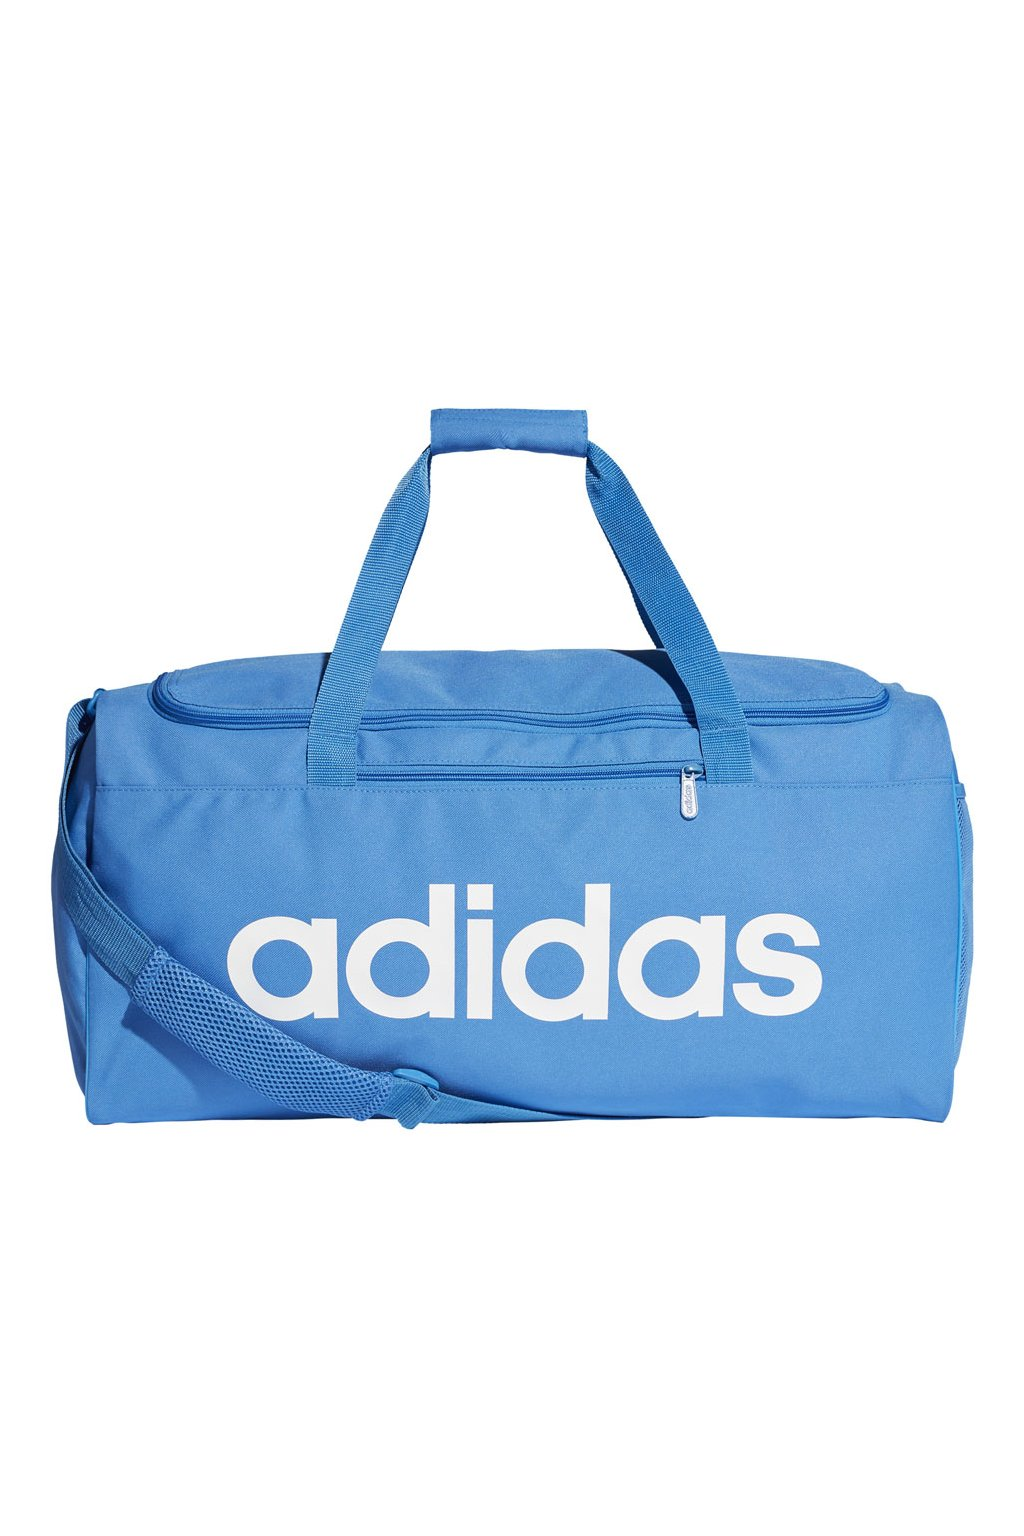 Taška Adidas Linear Core Duffel M modrá DT8621